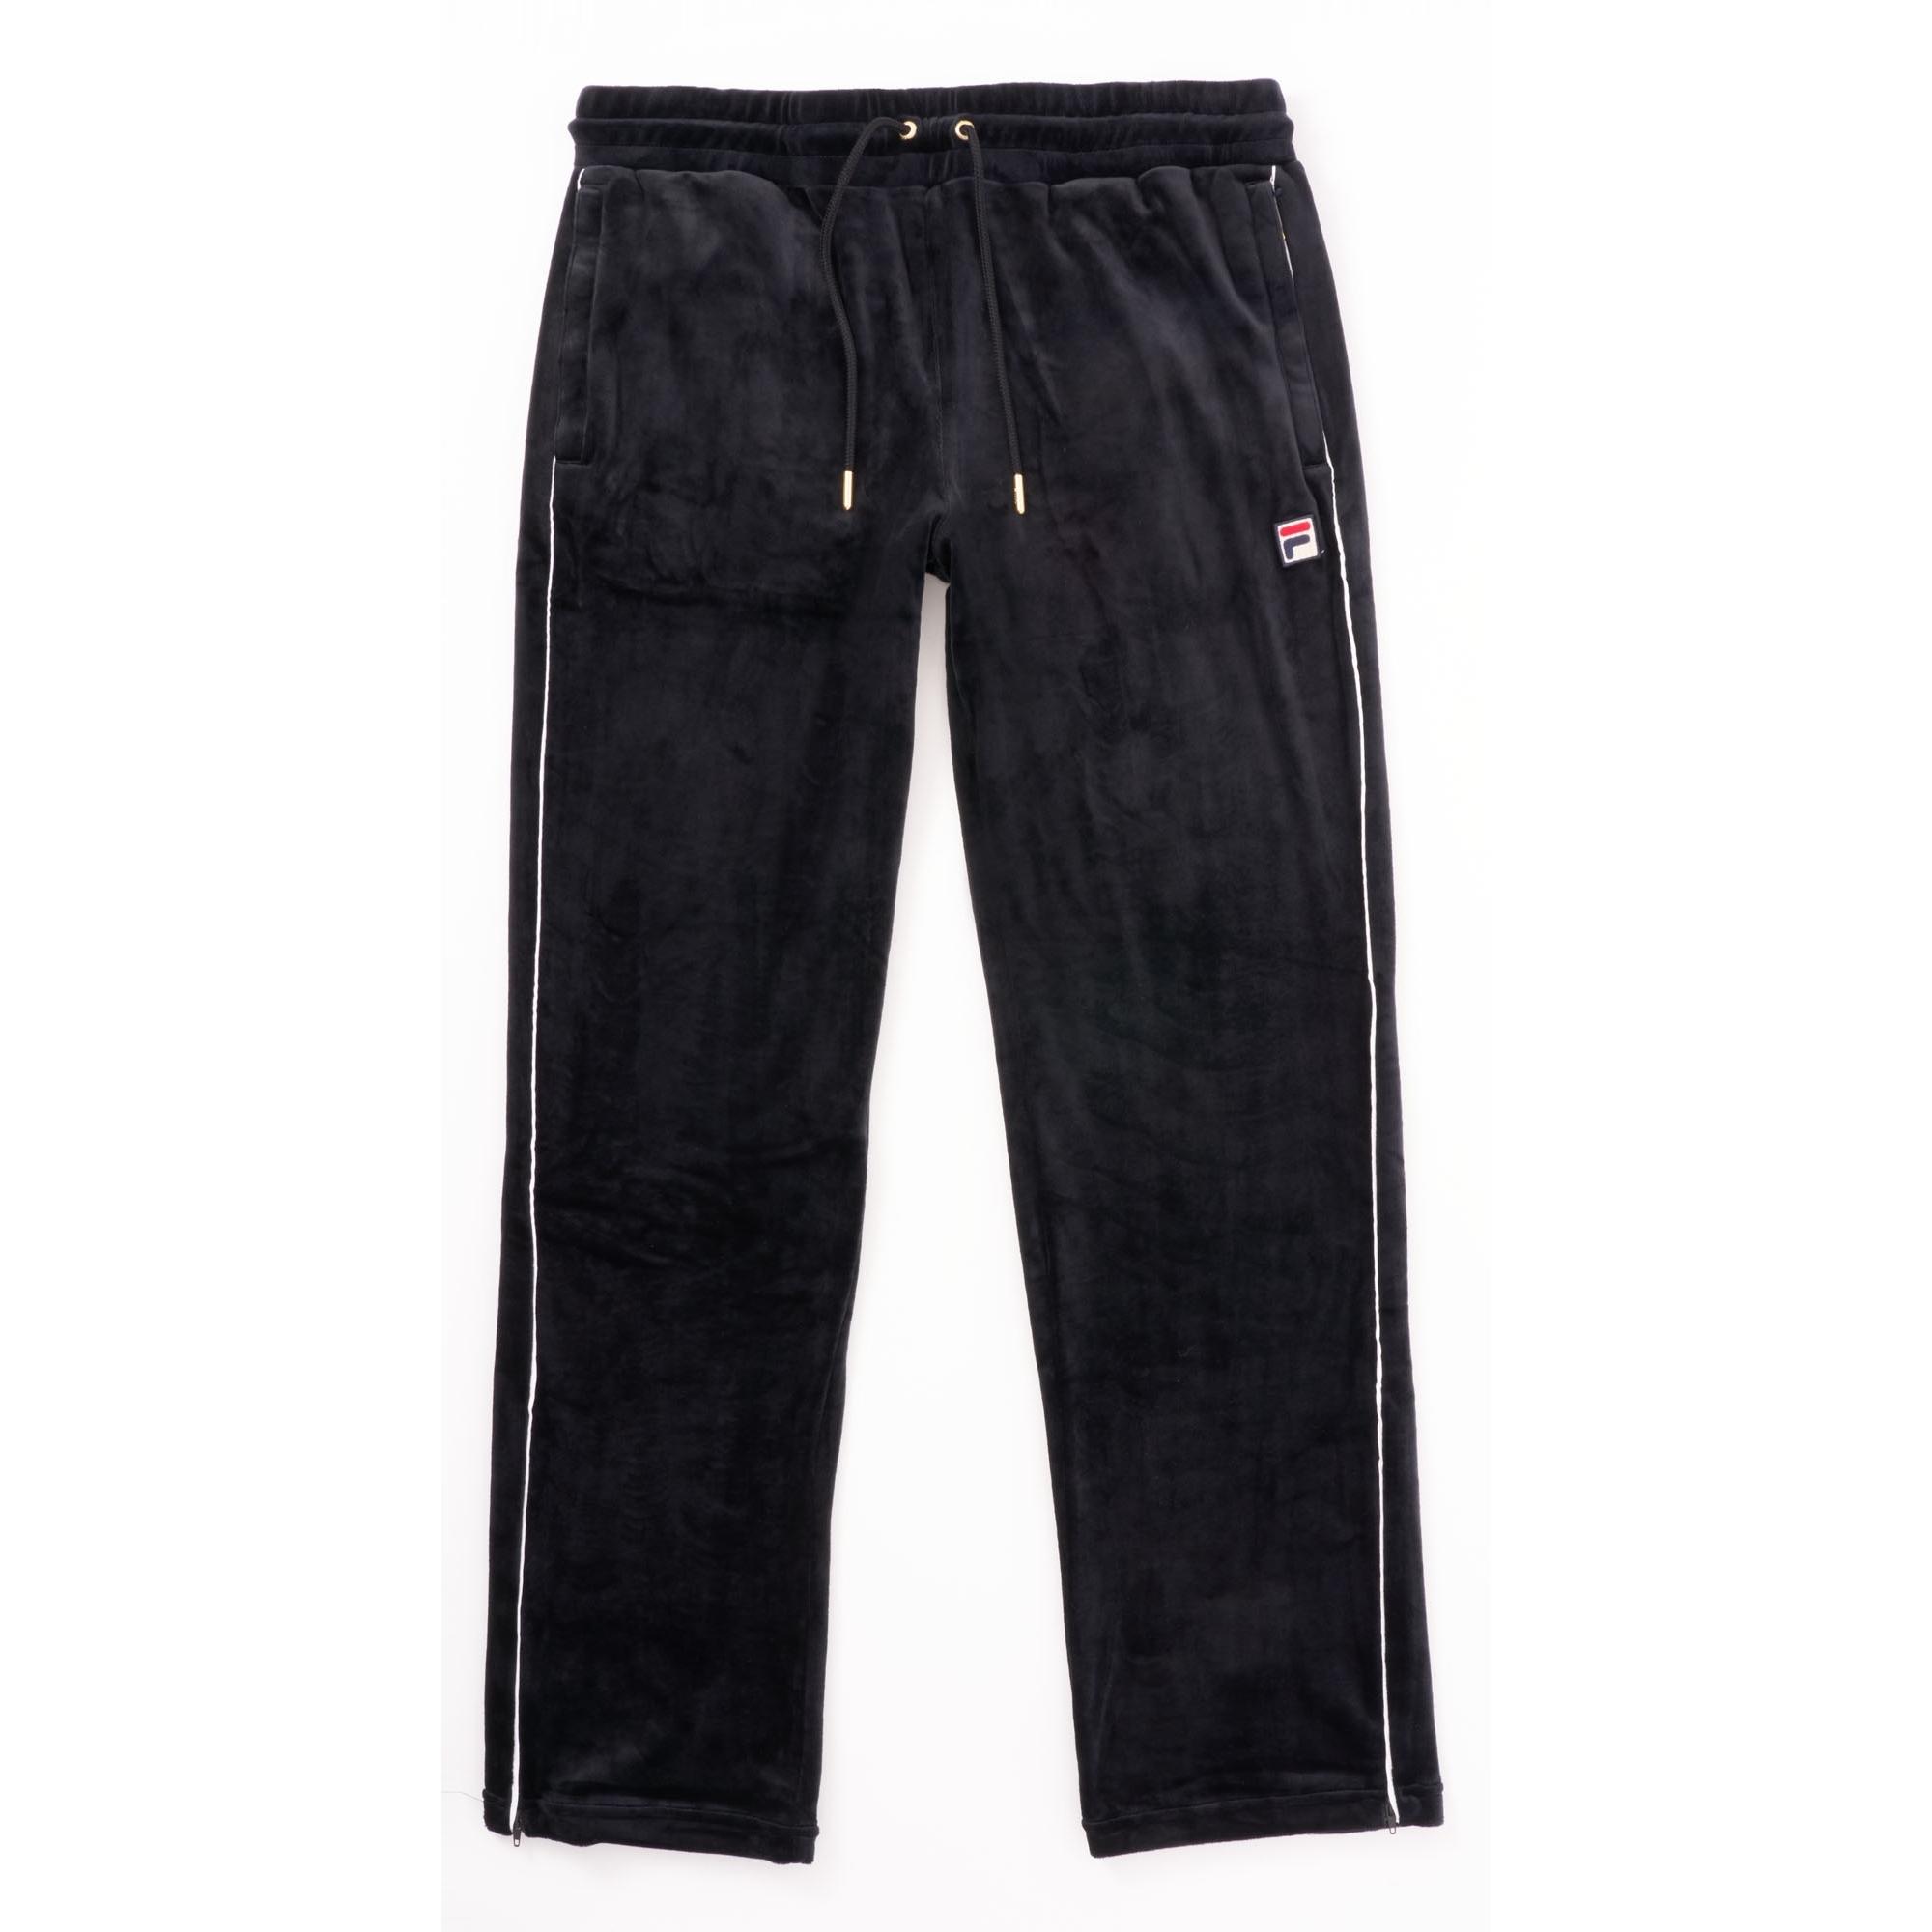 8af2bc13795 Fila Vintage Velour Cyrus Track Pants | Black | US Stockists